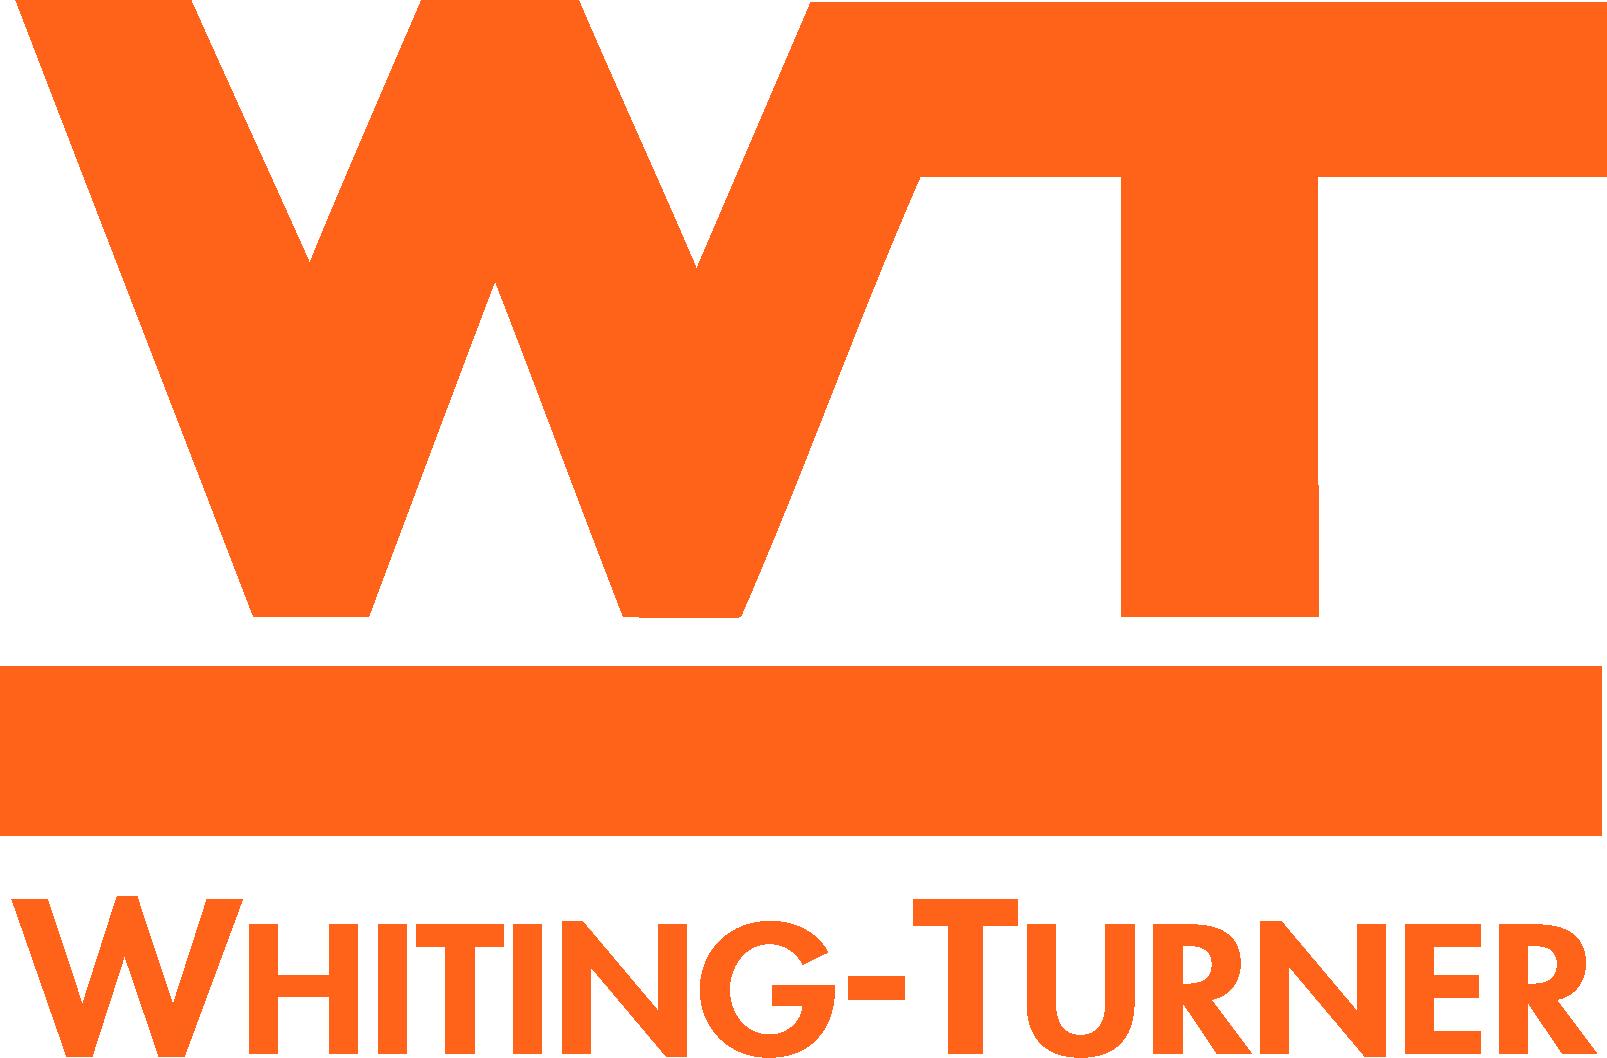 Design Awards: Whiting-Turner logo